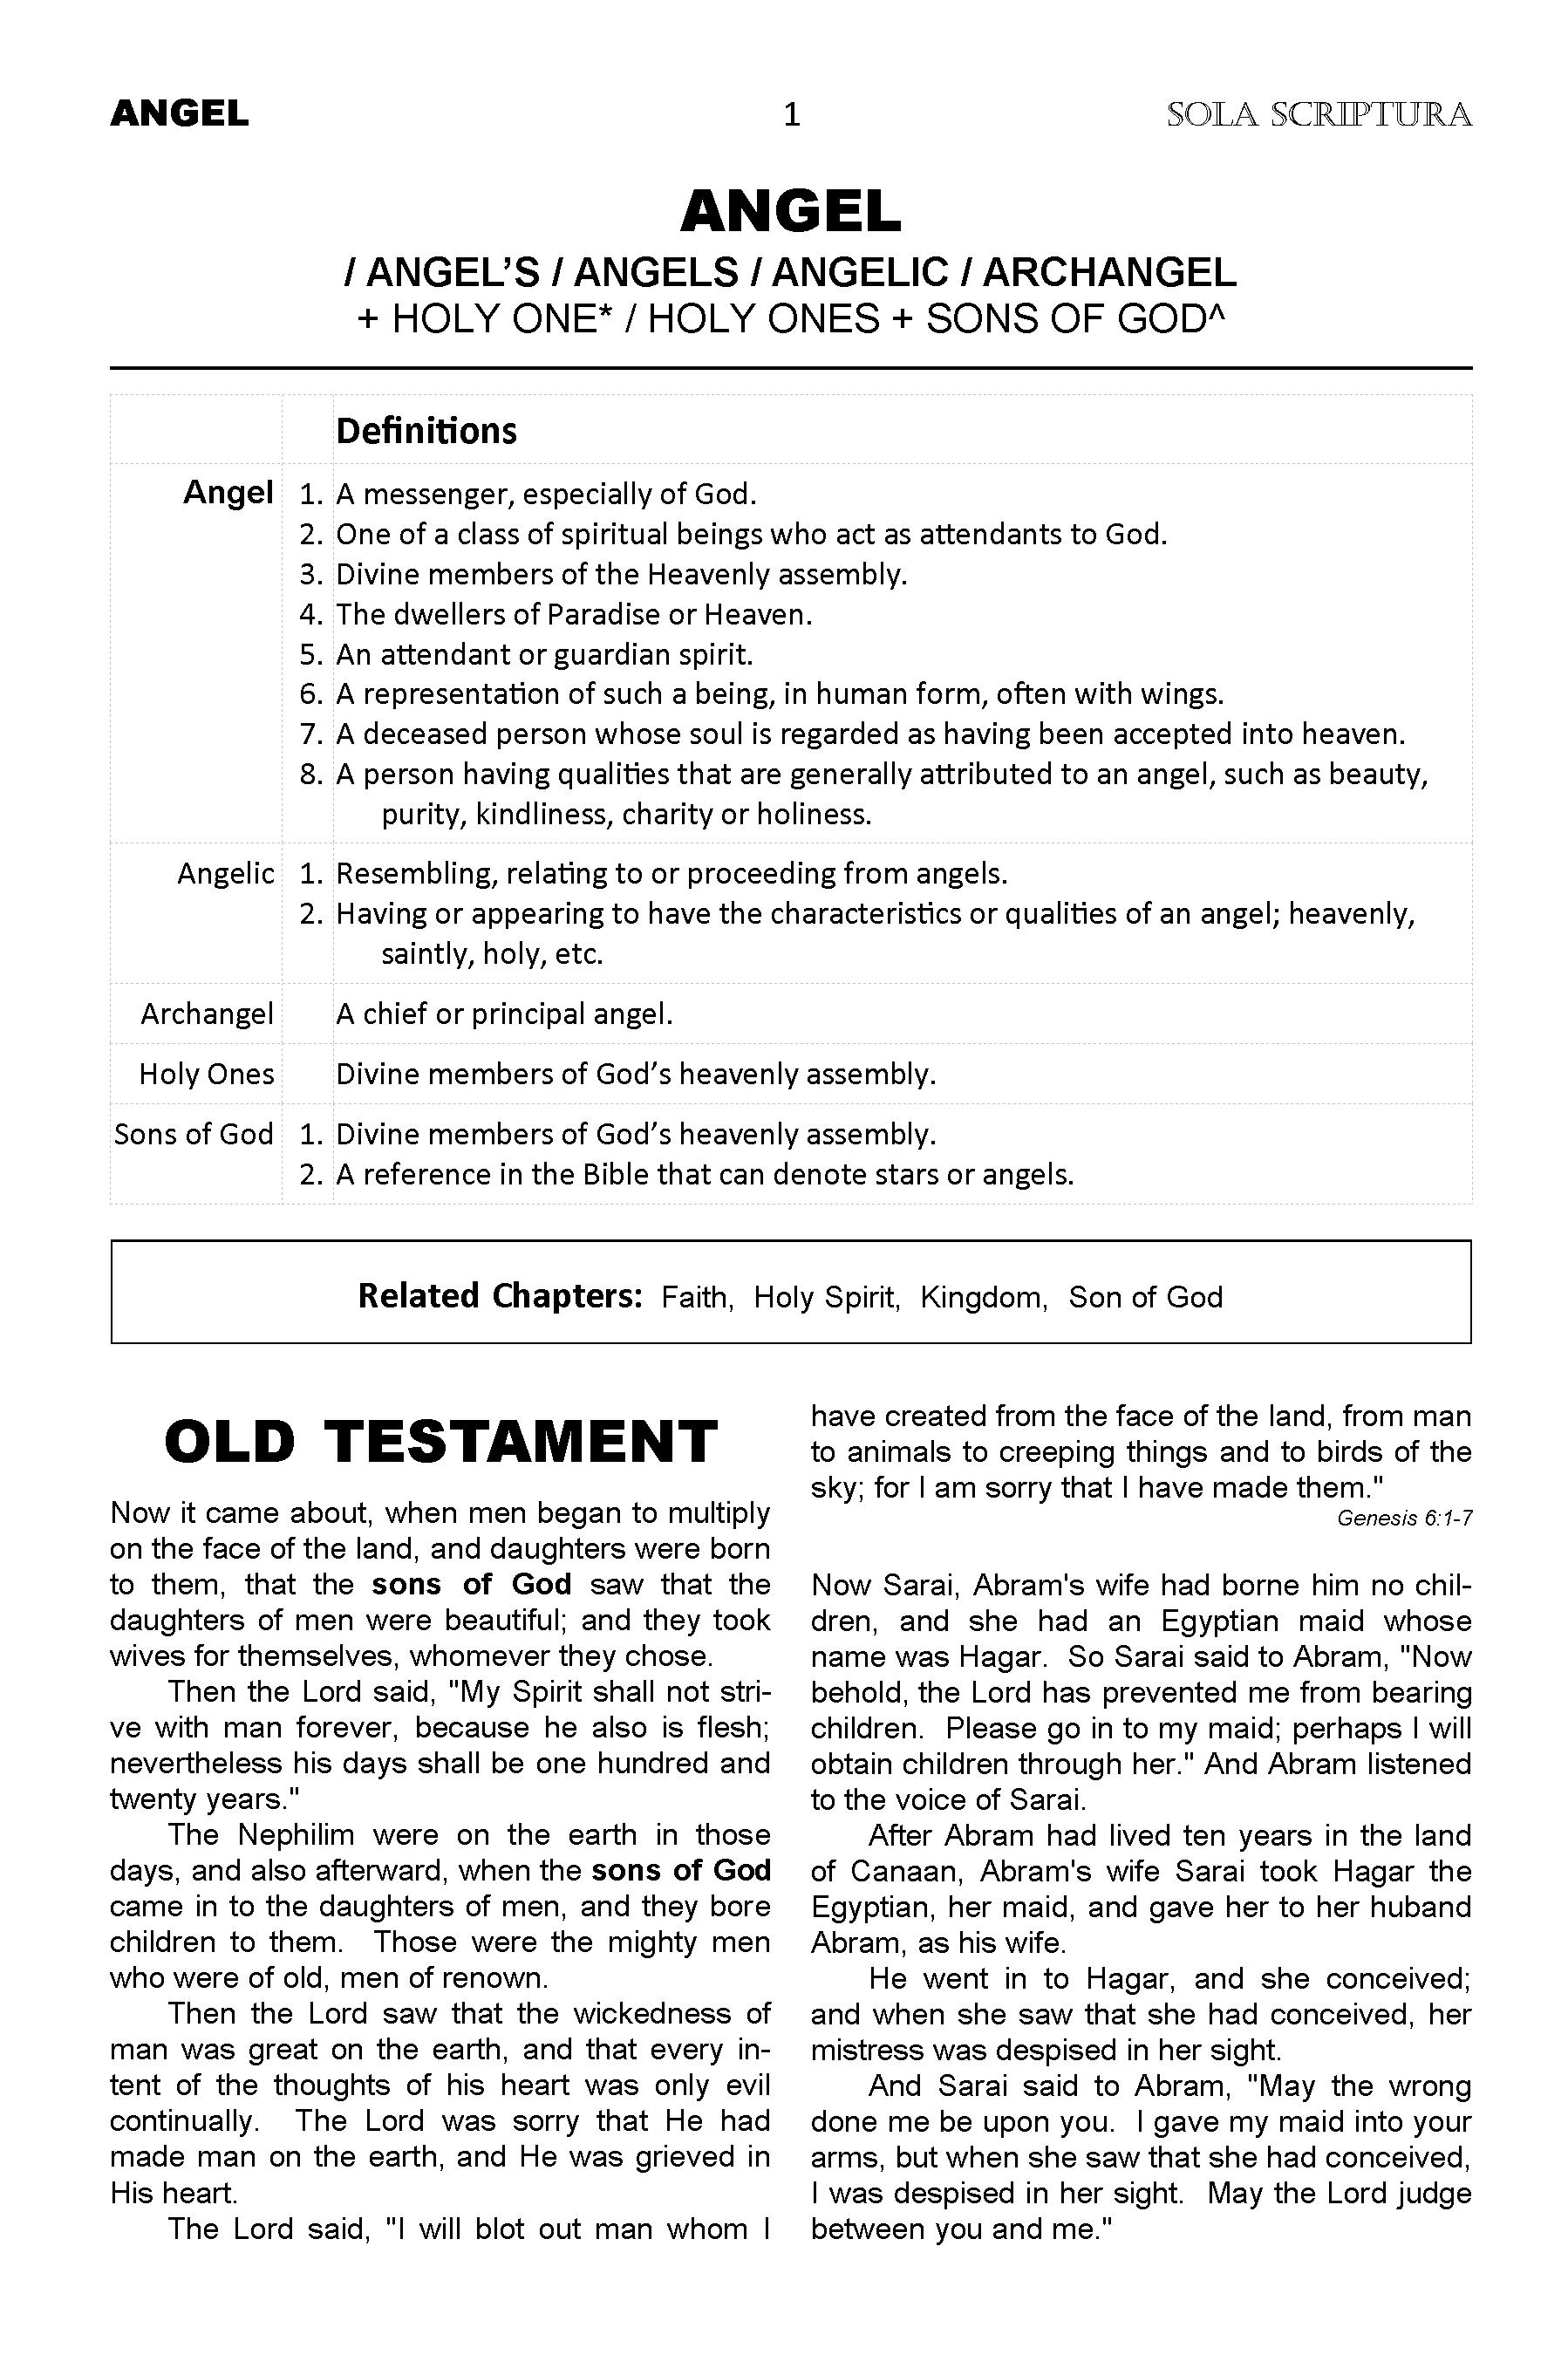 Sola Scriptura - Angel chapter